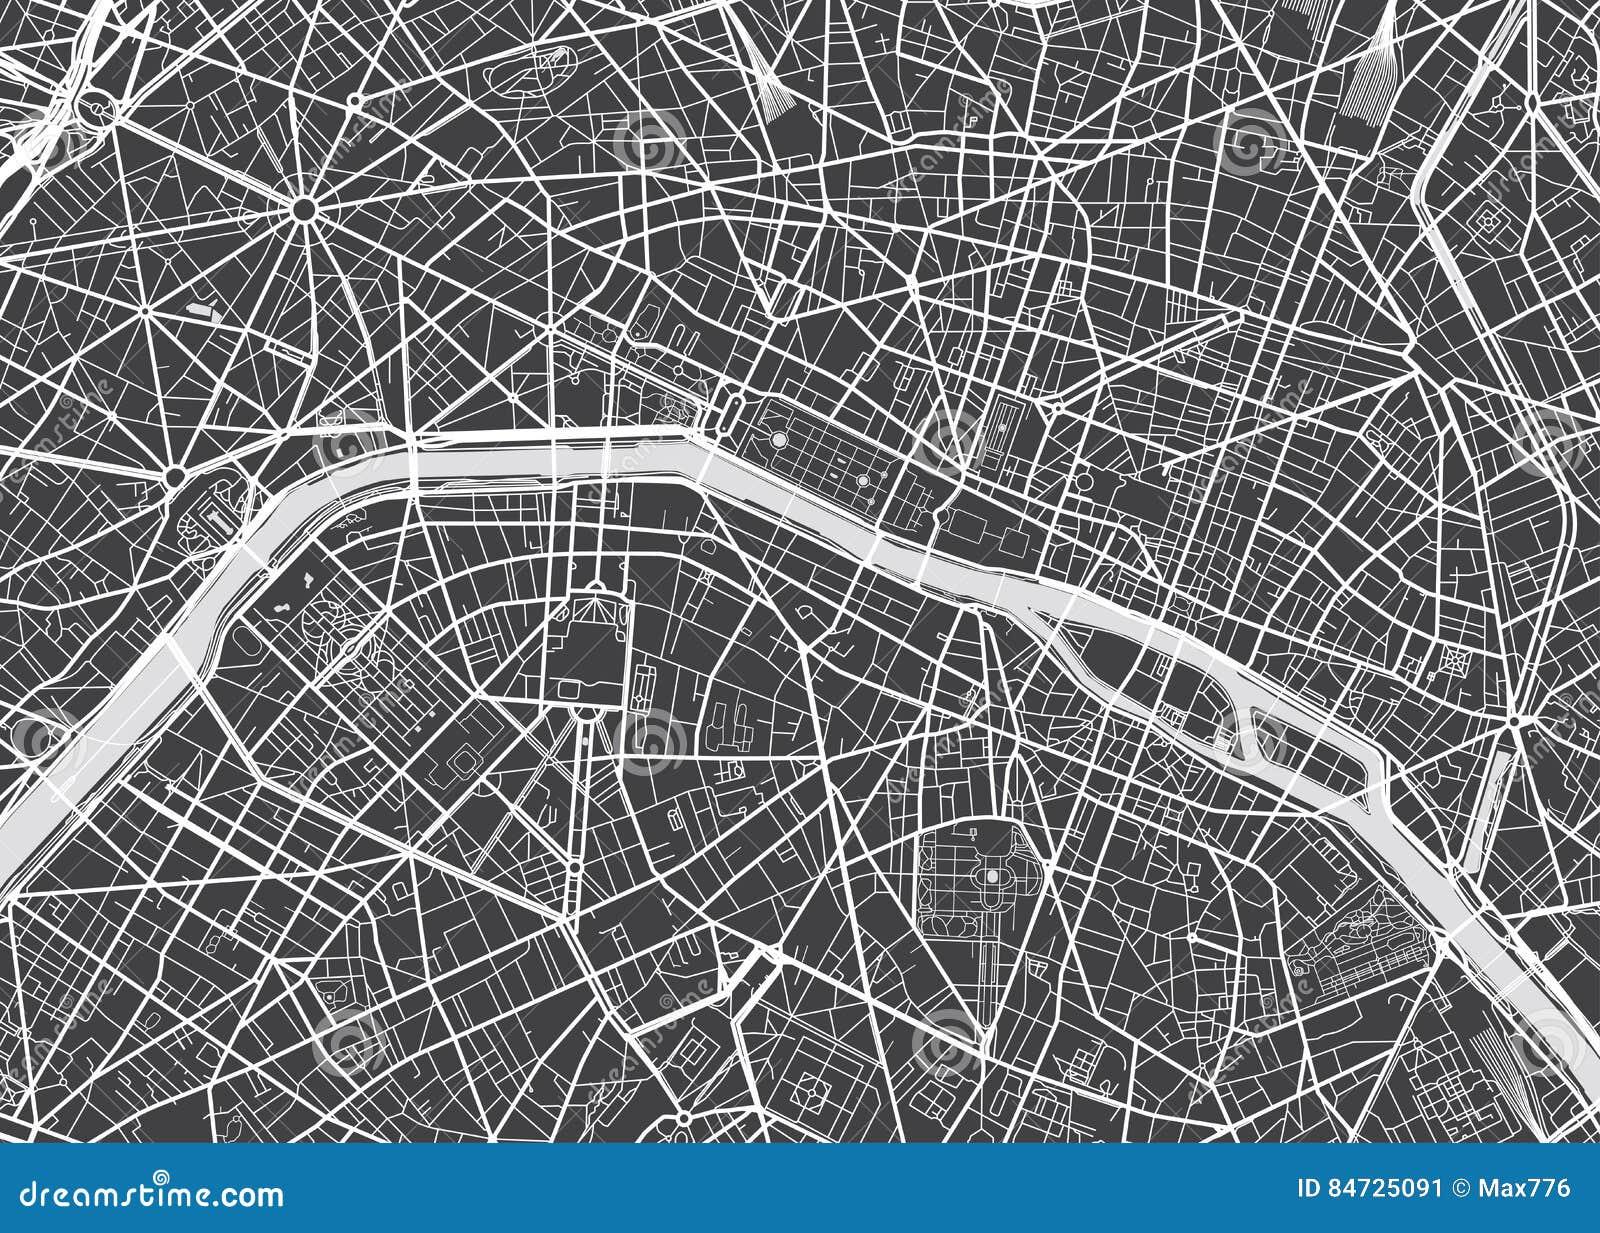 Paris Map Black And White.Vector Detailed Map Paris Stock Vector Illustration Of Metropolis